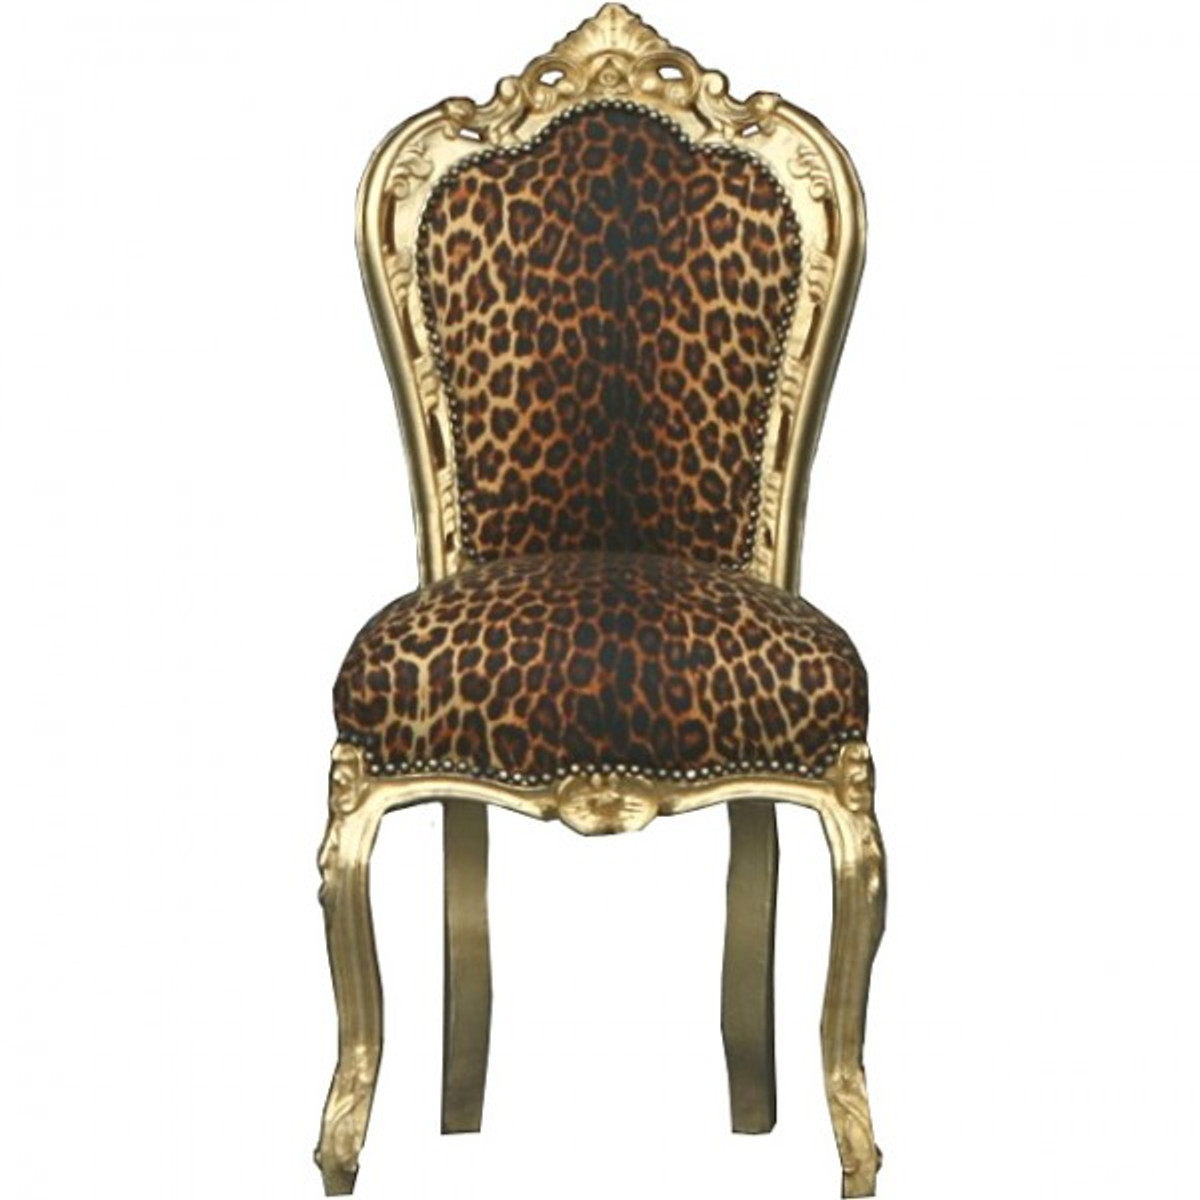 Casa Padrino Barock Esszimmer Stuhl Leopard / Gold - Möbel Stühle ...